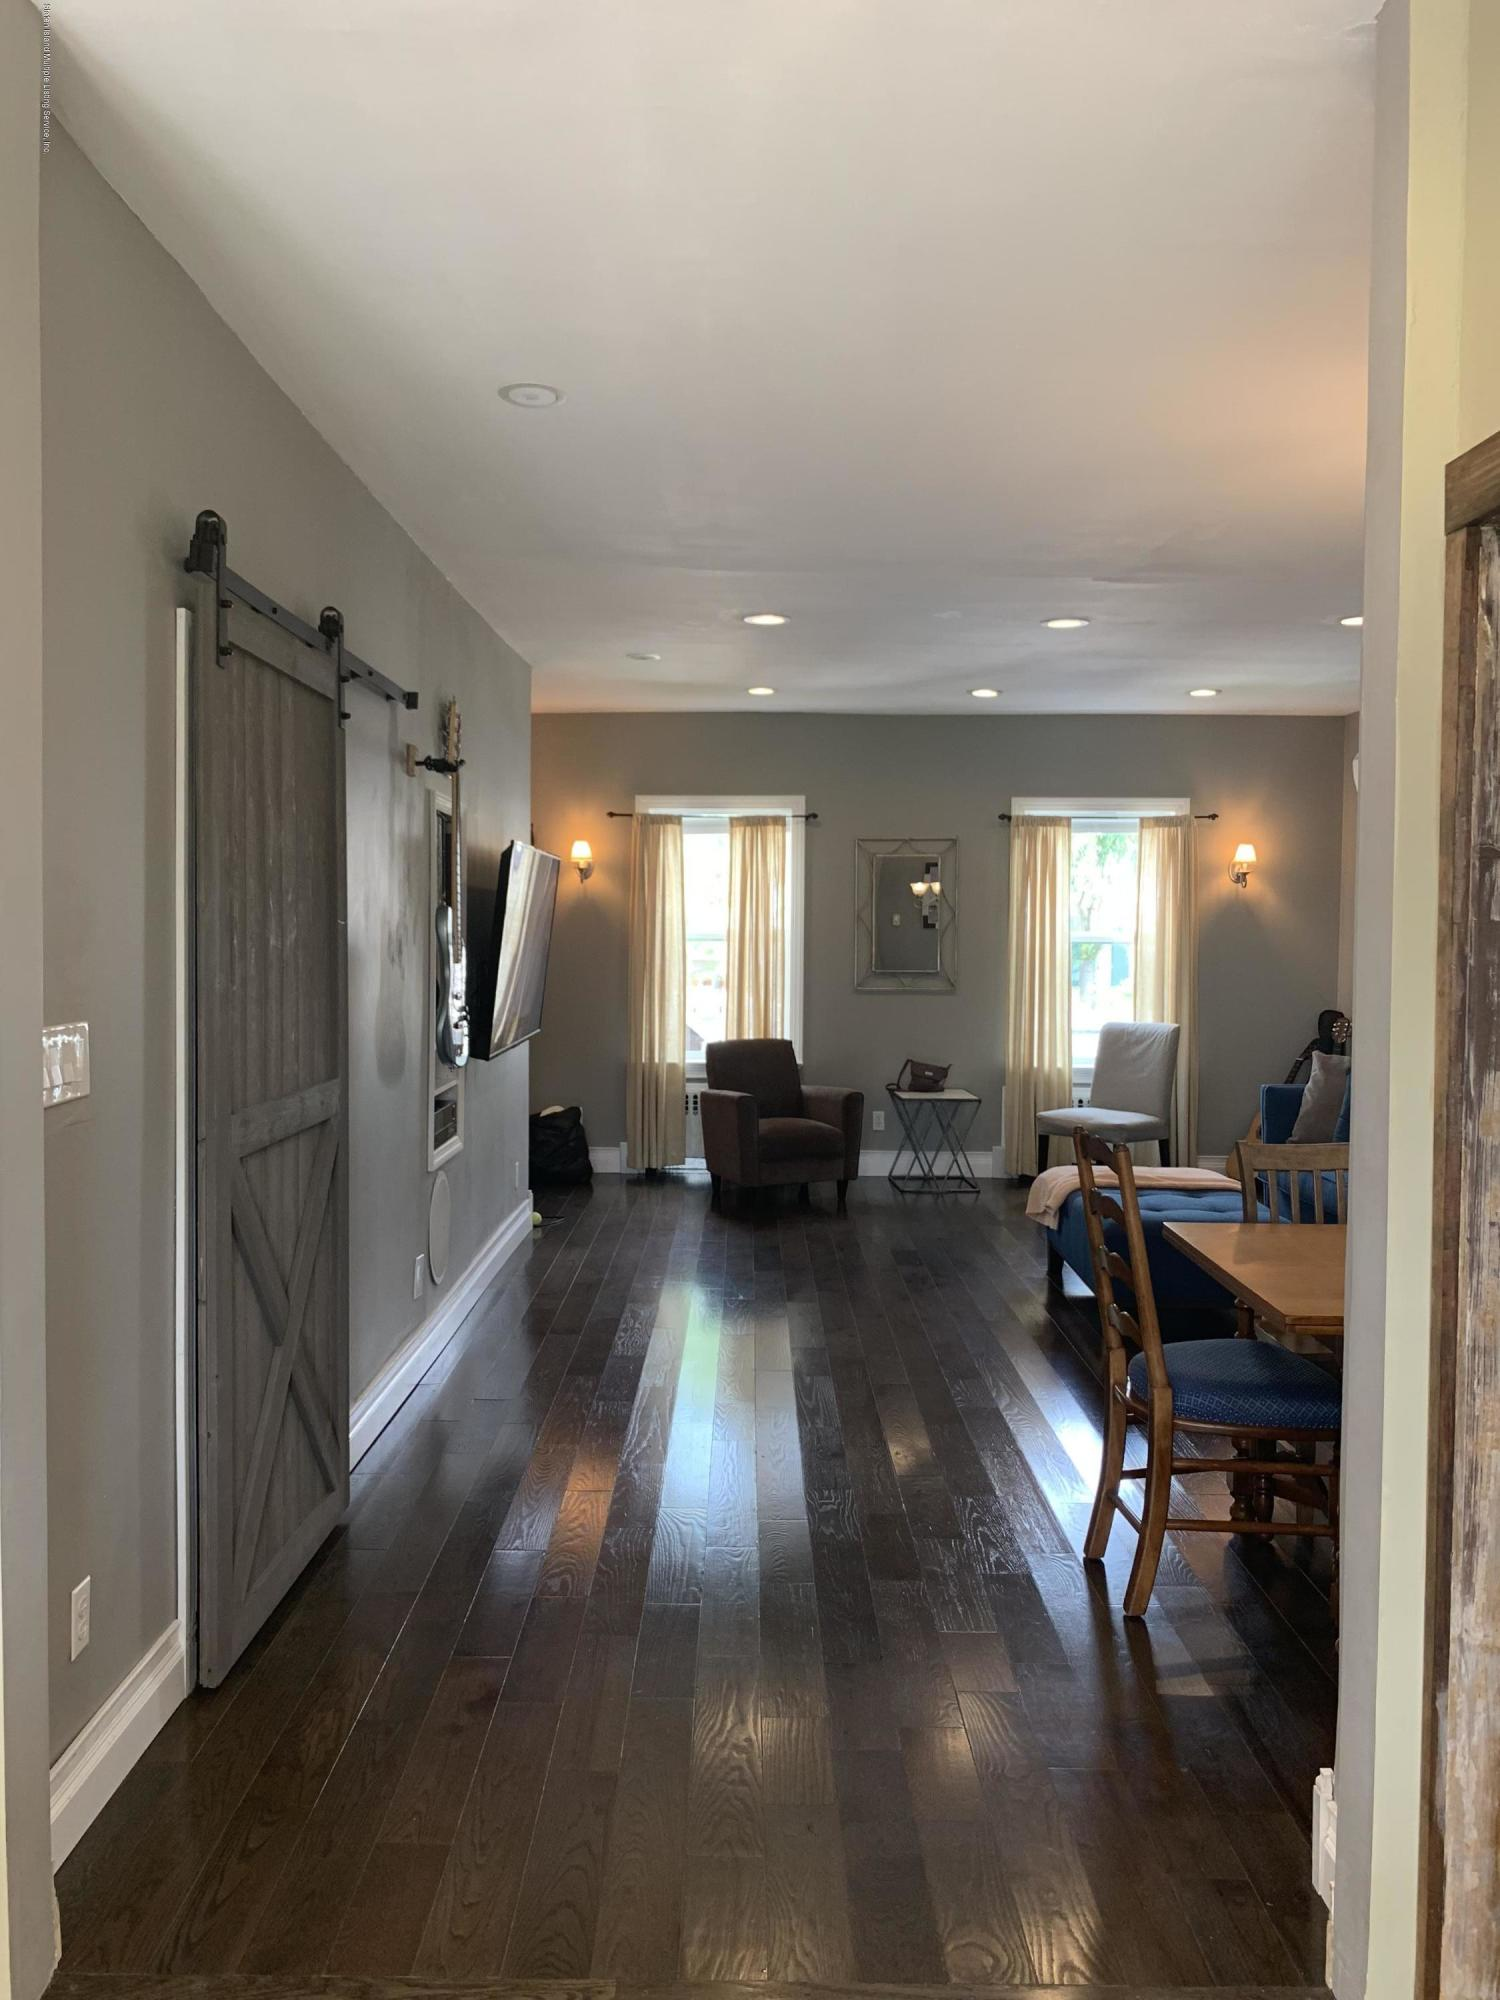 Single Family - Detached 62 St. Marys Avenue  Staten Island, NY 10305, MLS-1130534-11